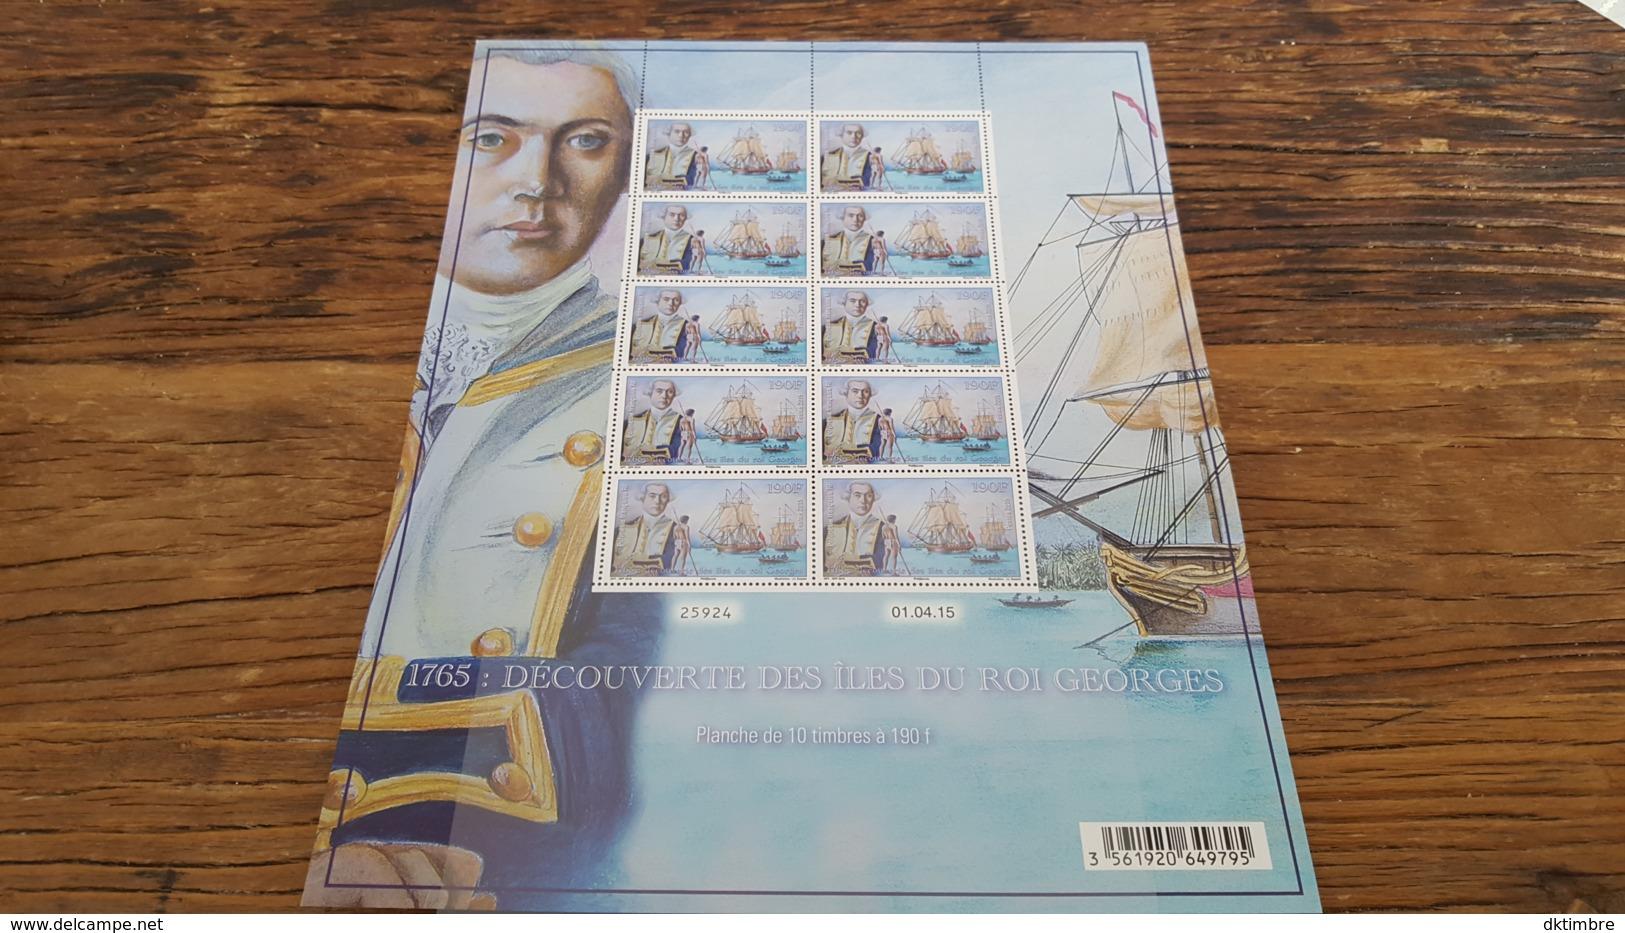 LOT 445400 TIMBRE DE COLONIE POLYNESIE NEUF** FEUILLE - French Polynesia